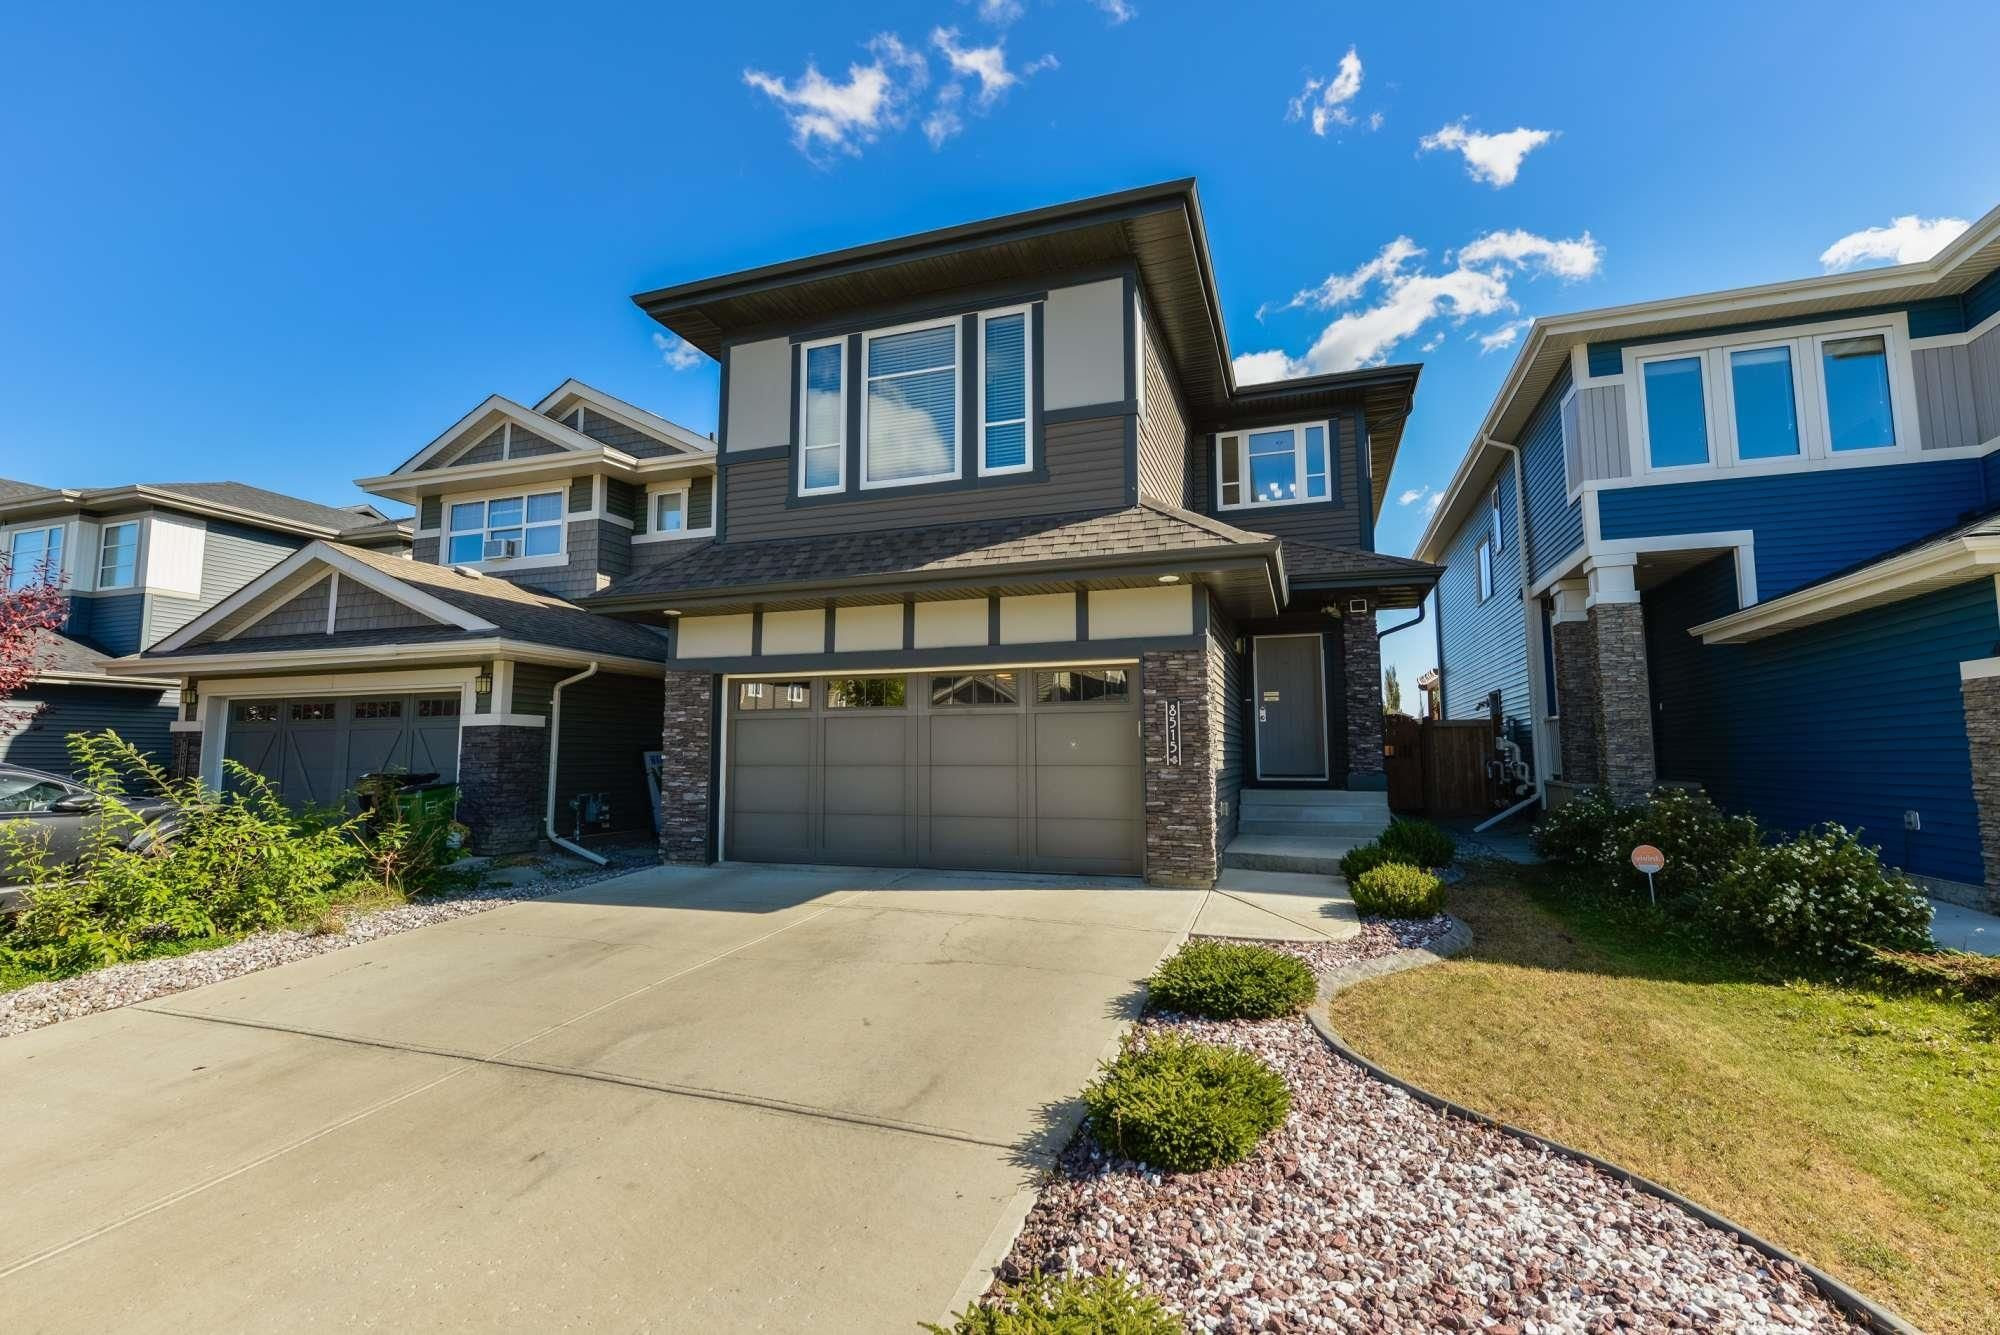 Main Photo: 8515 216 Street in Edmonton: Zone 58 House for sale : MLS®# E4264294